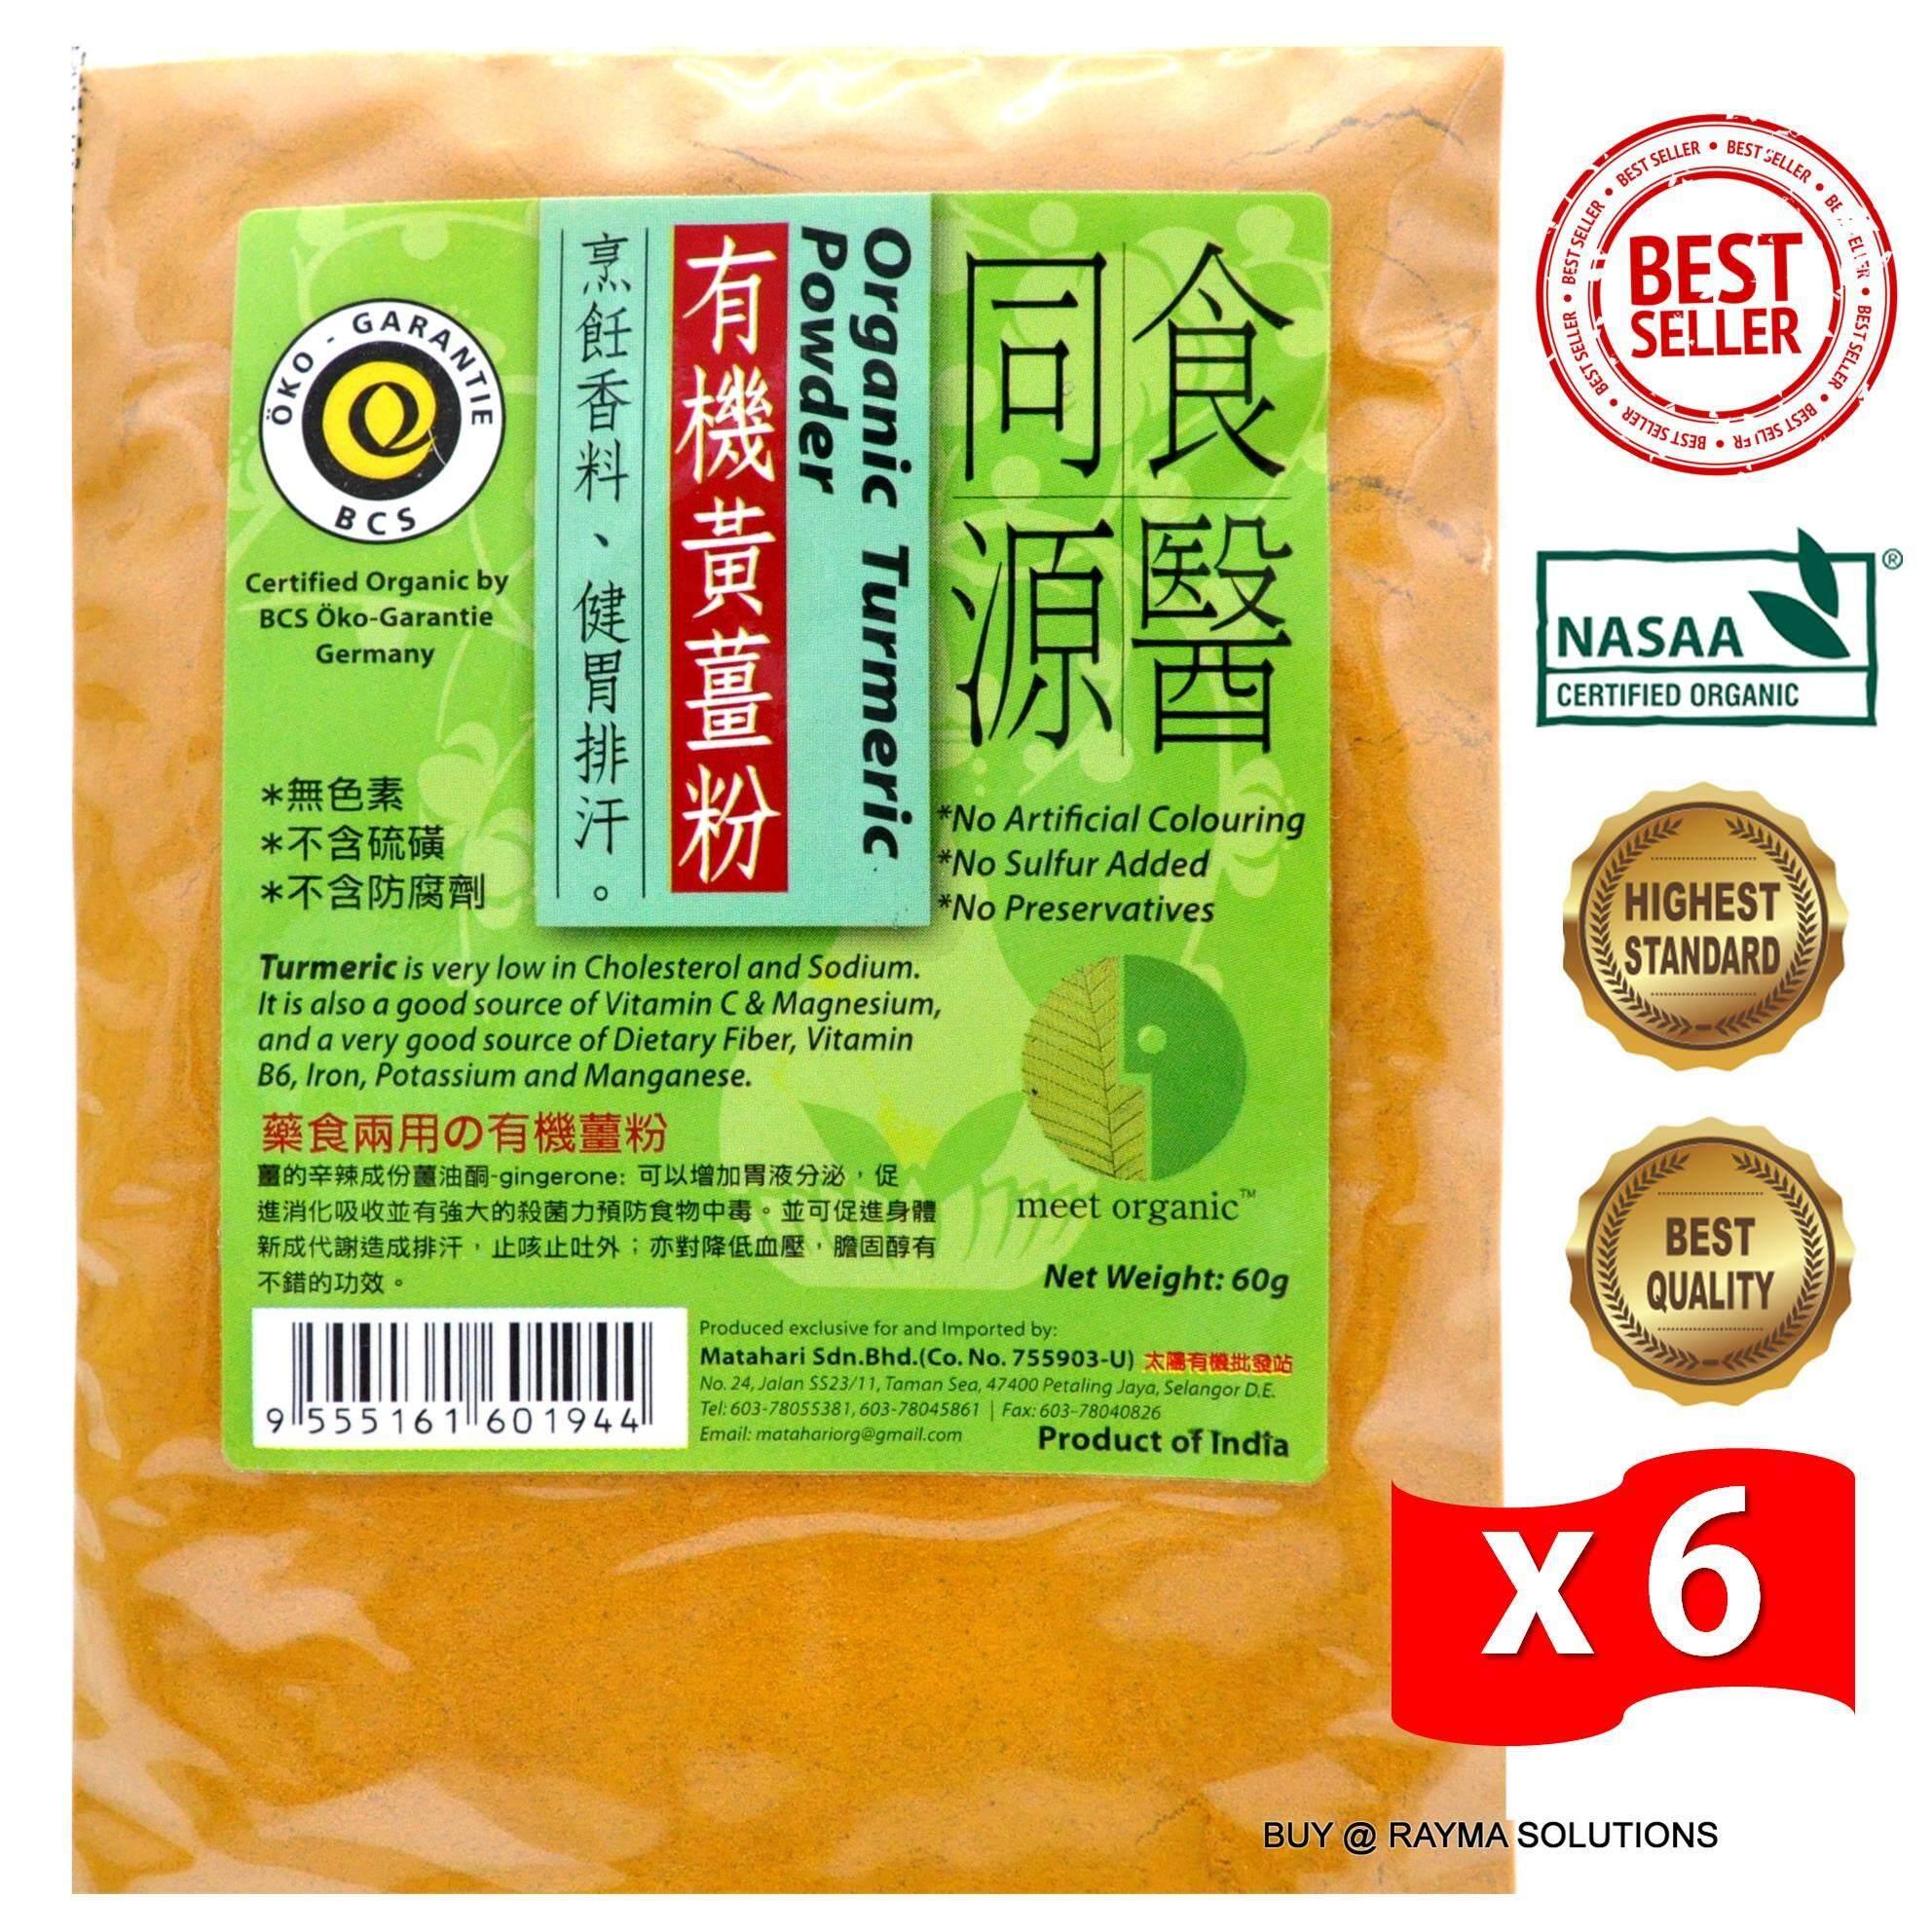 [ Best Deal ] MH FOOD Organic Turmeric Powder 60g (6 Packs)